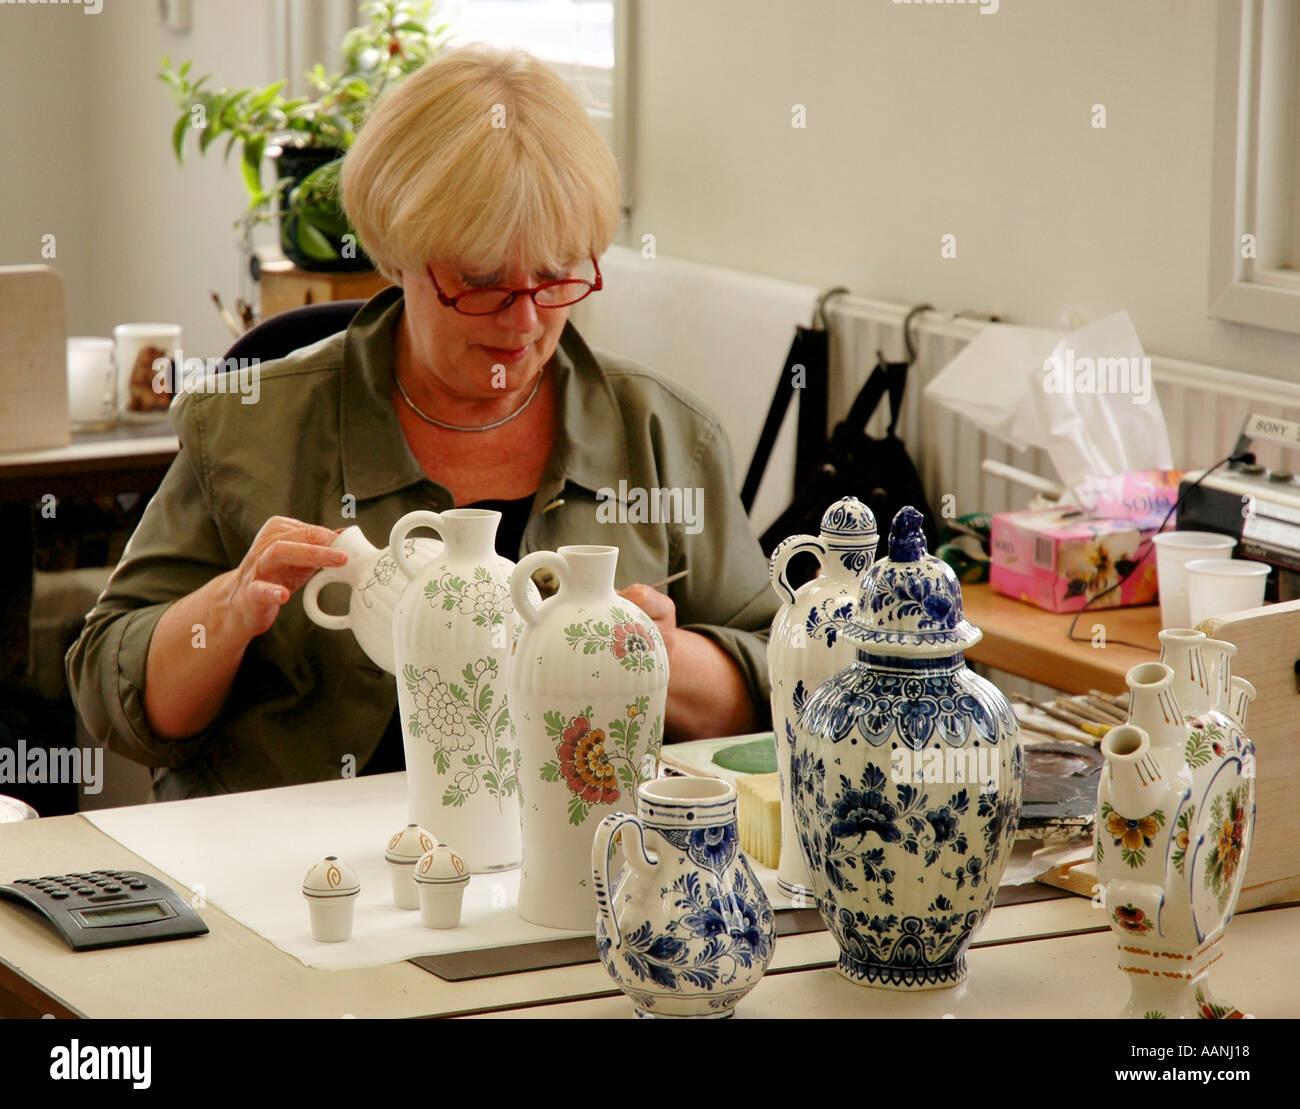 Delft, Holland Artist hand painting traditional dutch blue pottery De Delftse Pauw manufacturer location near Amsterdam, Holland - Stock Image